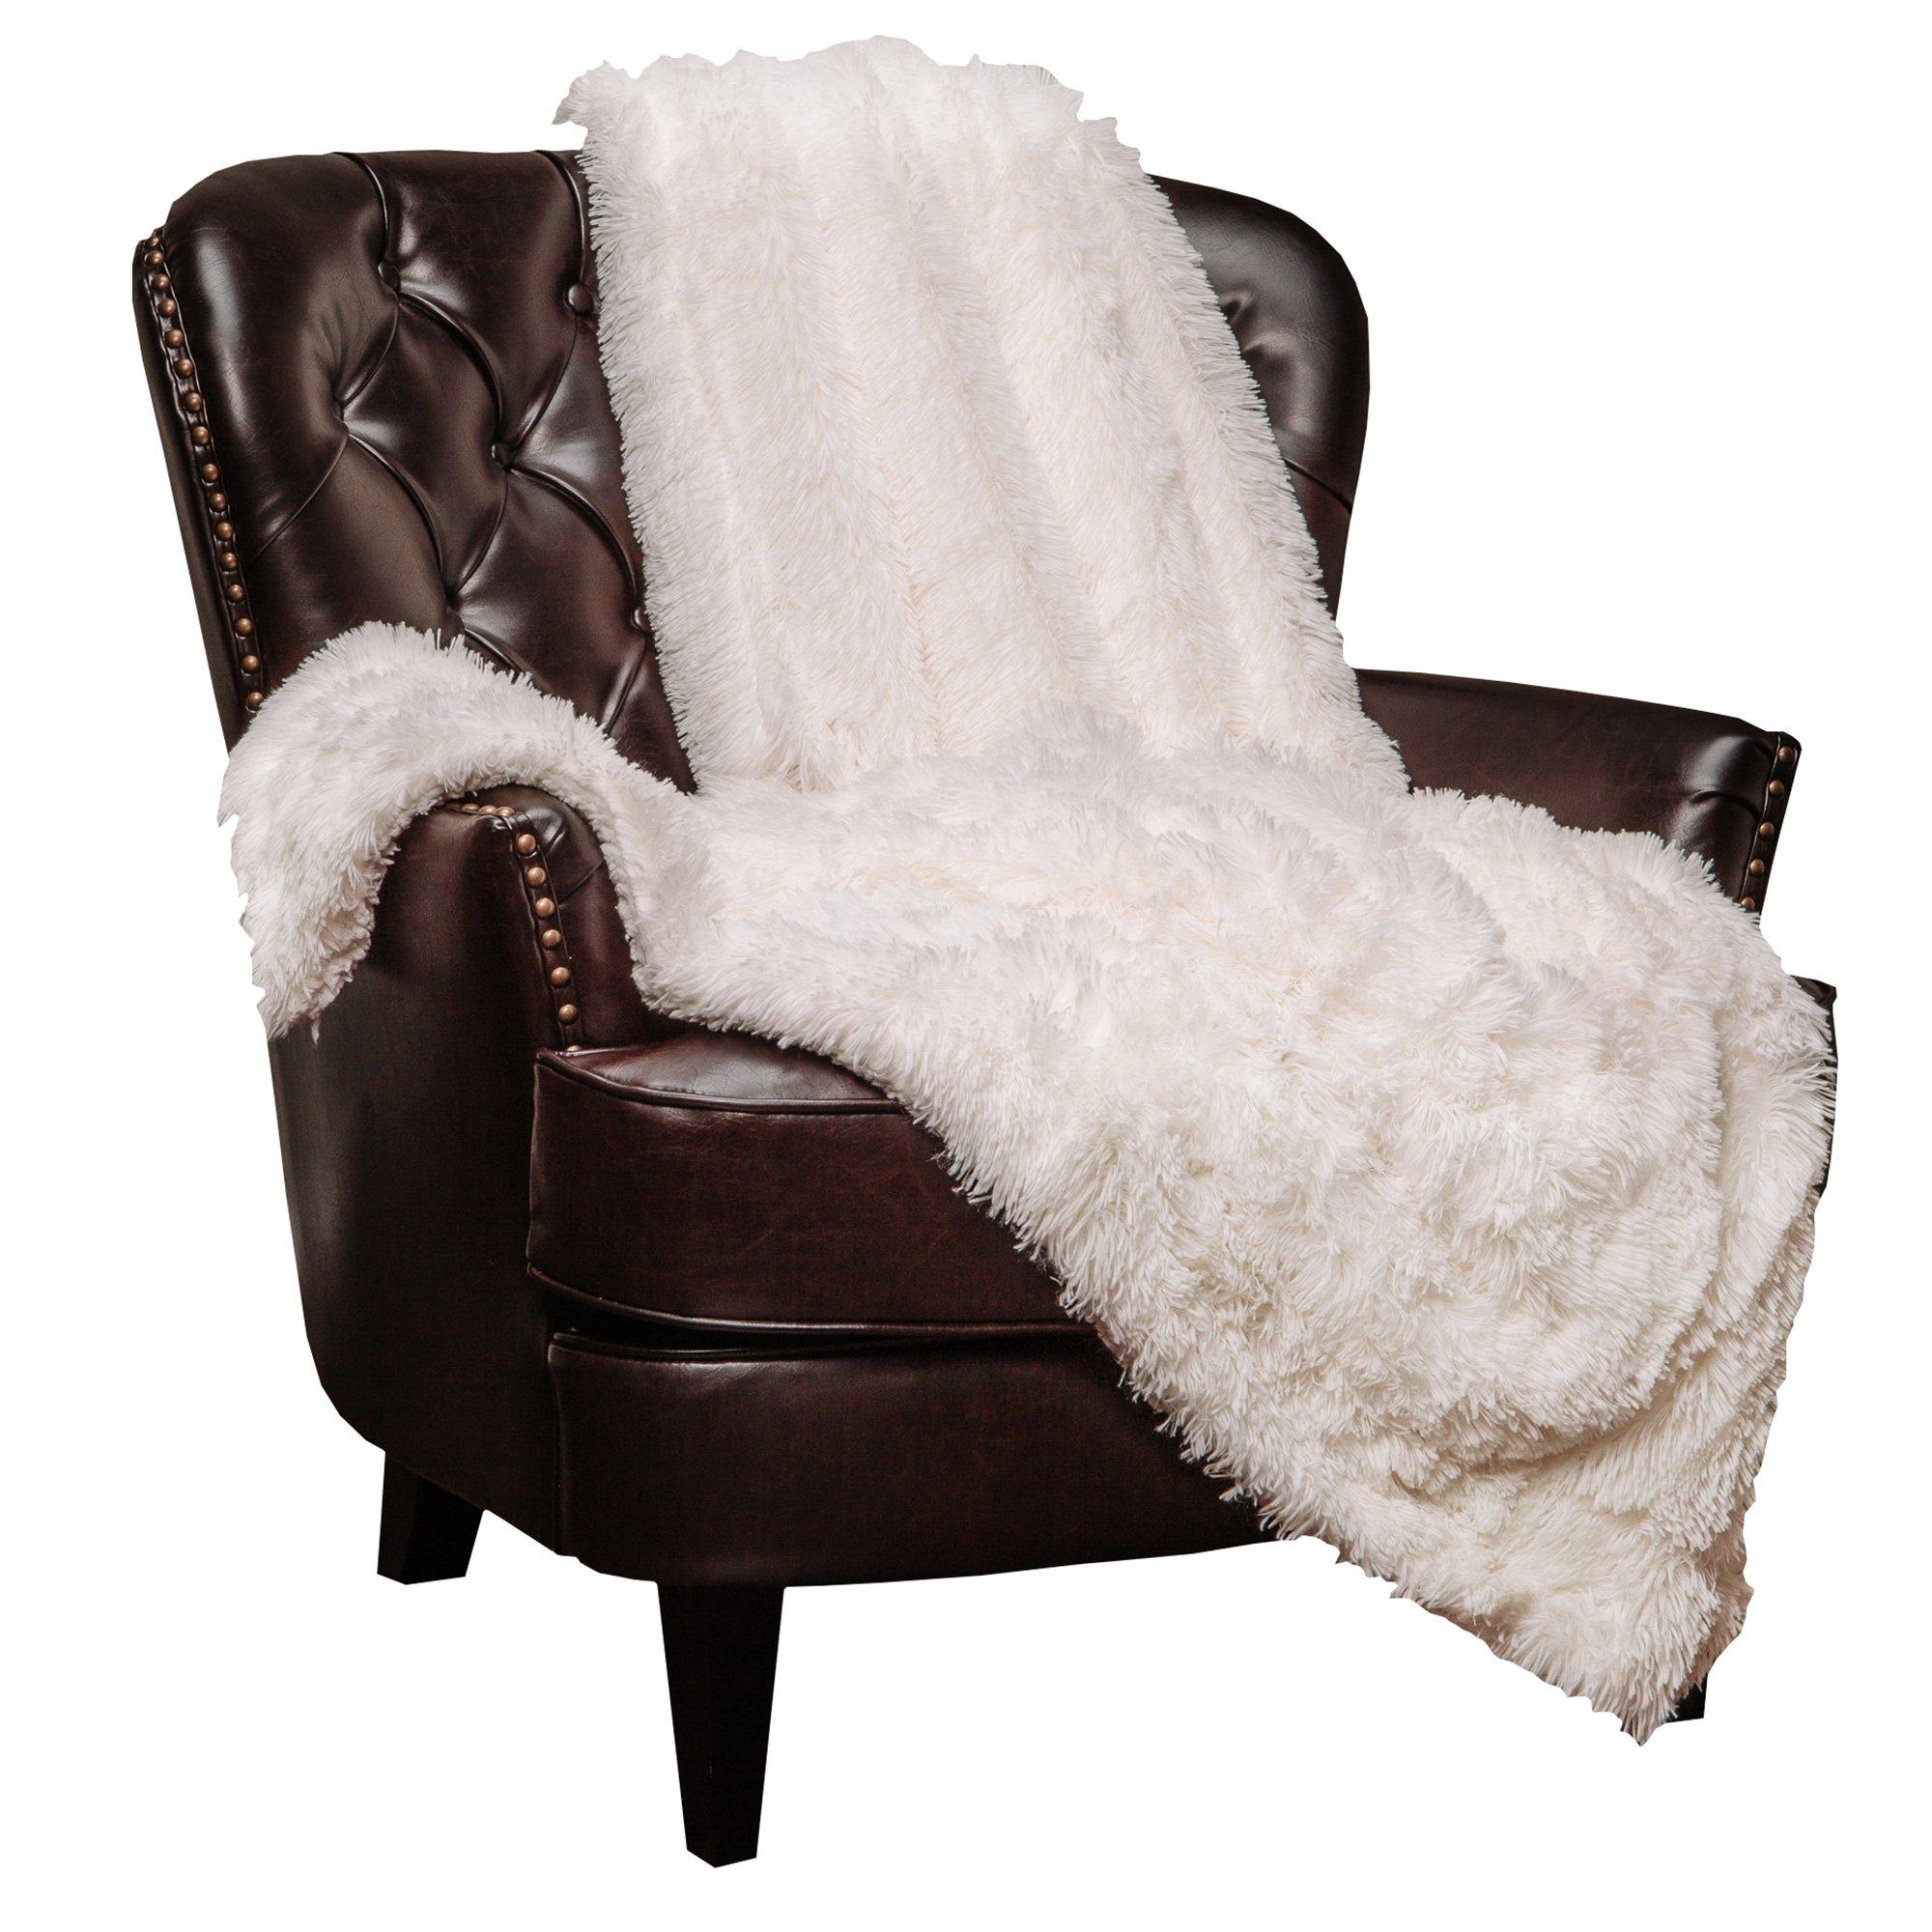 Chanasya Super Soft Shaggy Longfur Throw Blanket | Snuggly Fuzzy Faux Fur Lightweight Warm Elegant Cozy Plush Sherpa Fleece Microfiber Blanket | For Couch Bed Chair Photo Props - 50''x 65'' - White